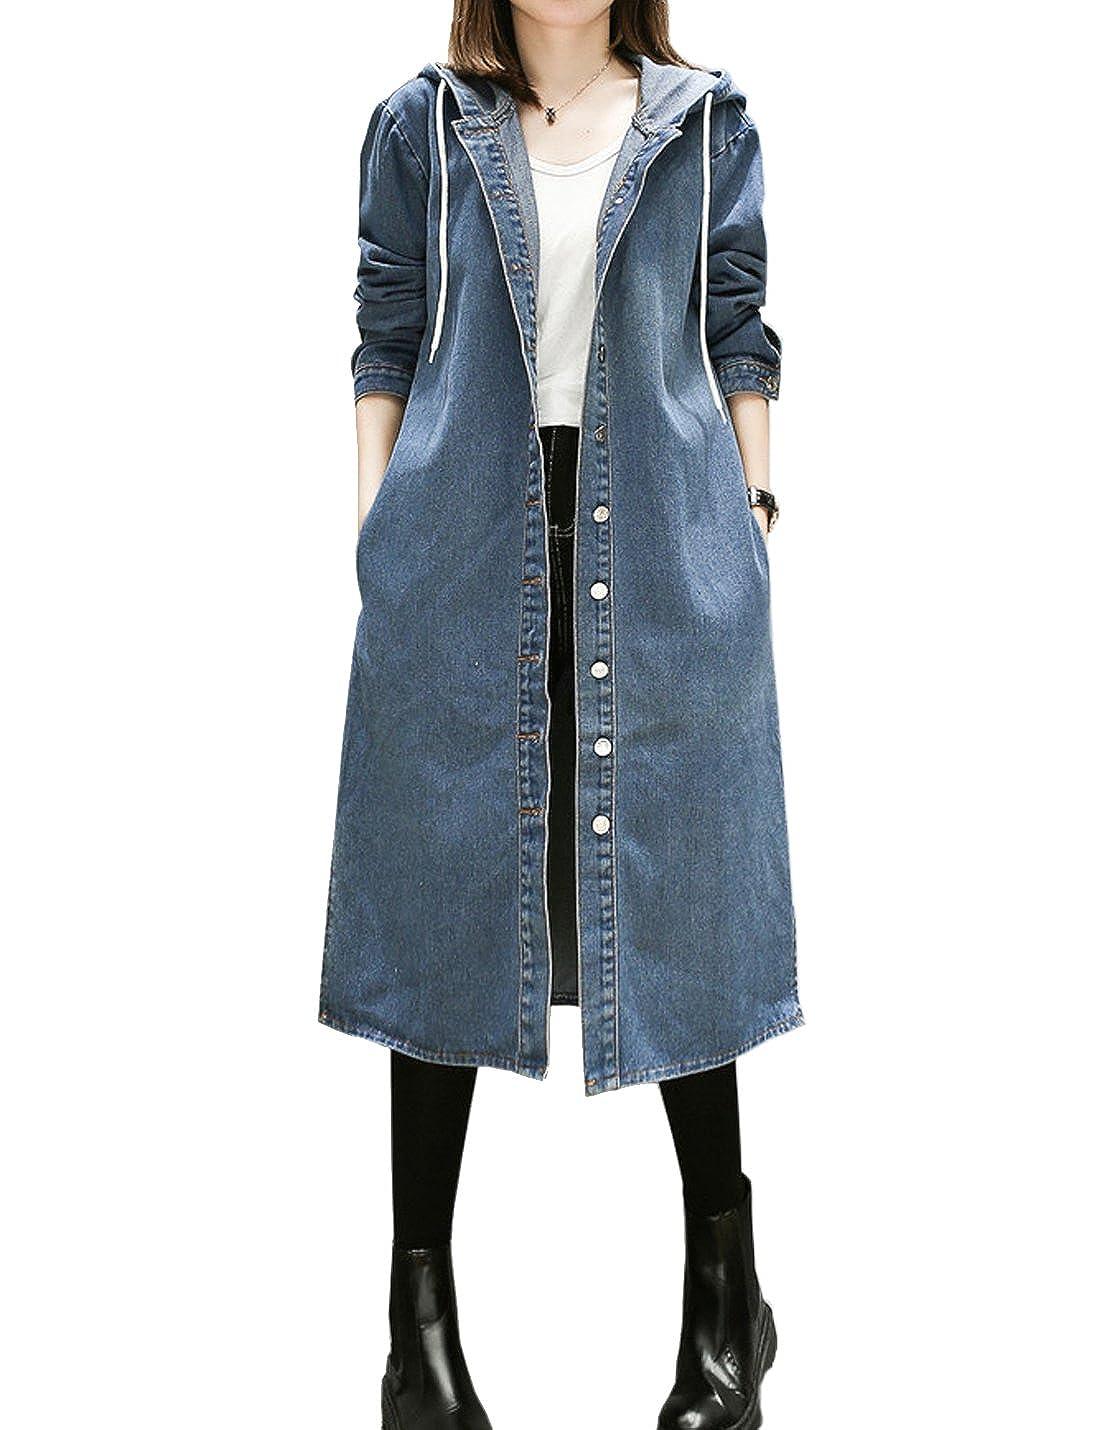 Flygo Women's Plus Size Hoodie Long Denim Trench Coat Jacket Windbreaker